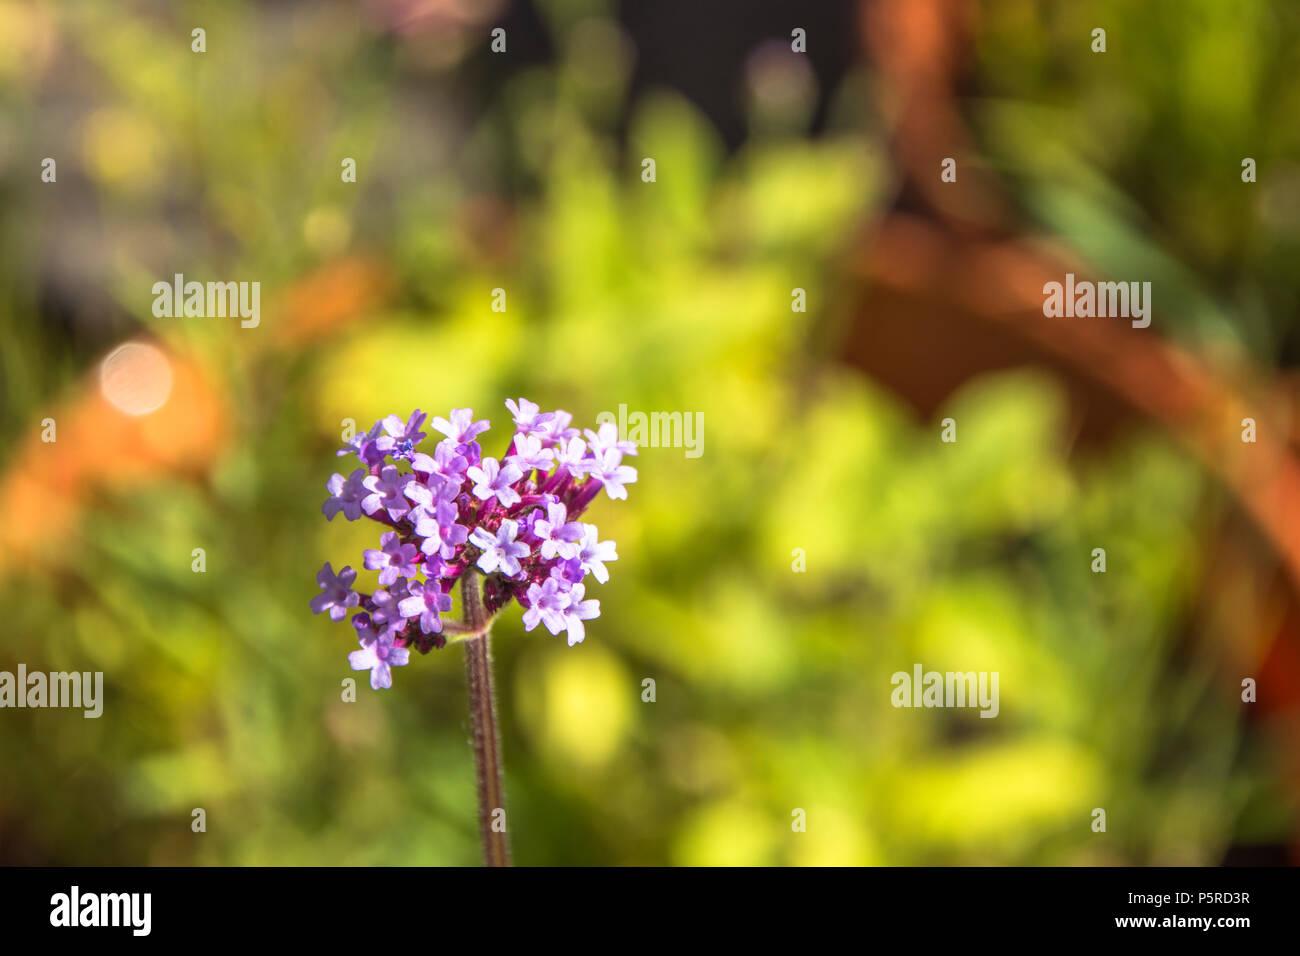 Argentinian vervain purple top v bonariensis is a tall perennial argentinian vervain purple top v bonariensis is a tall perennial 5 petalled salver shaped flowers annuals perennials izmirmasajfo